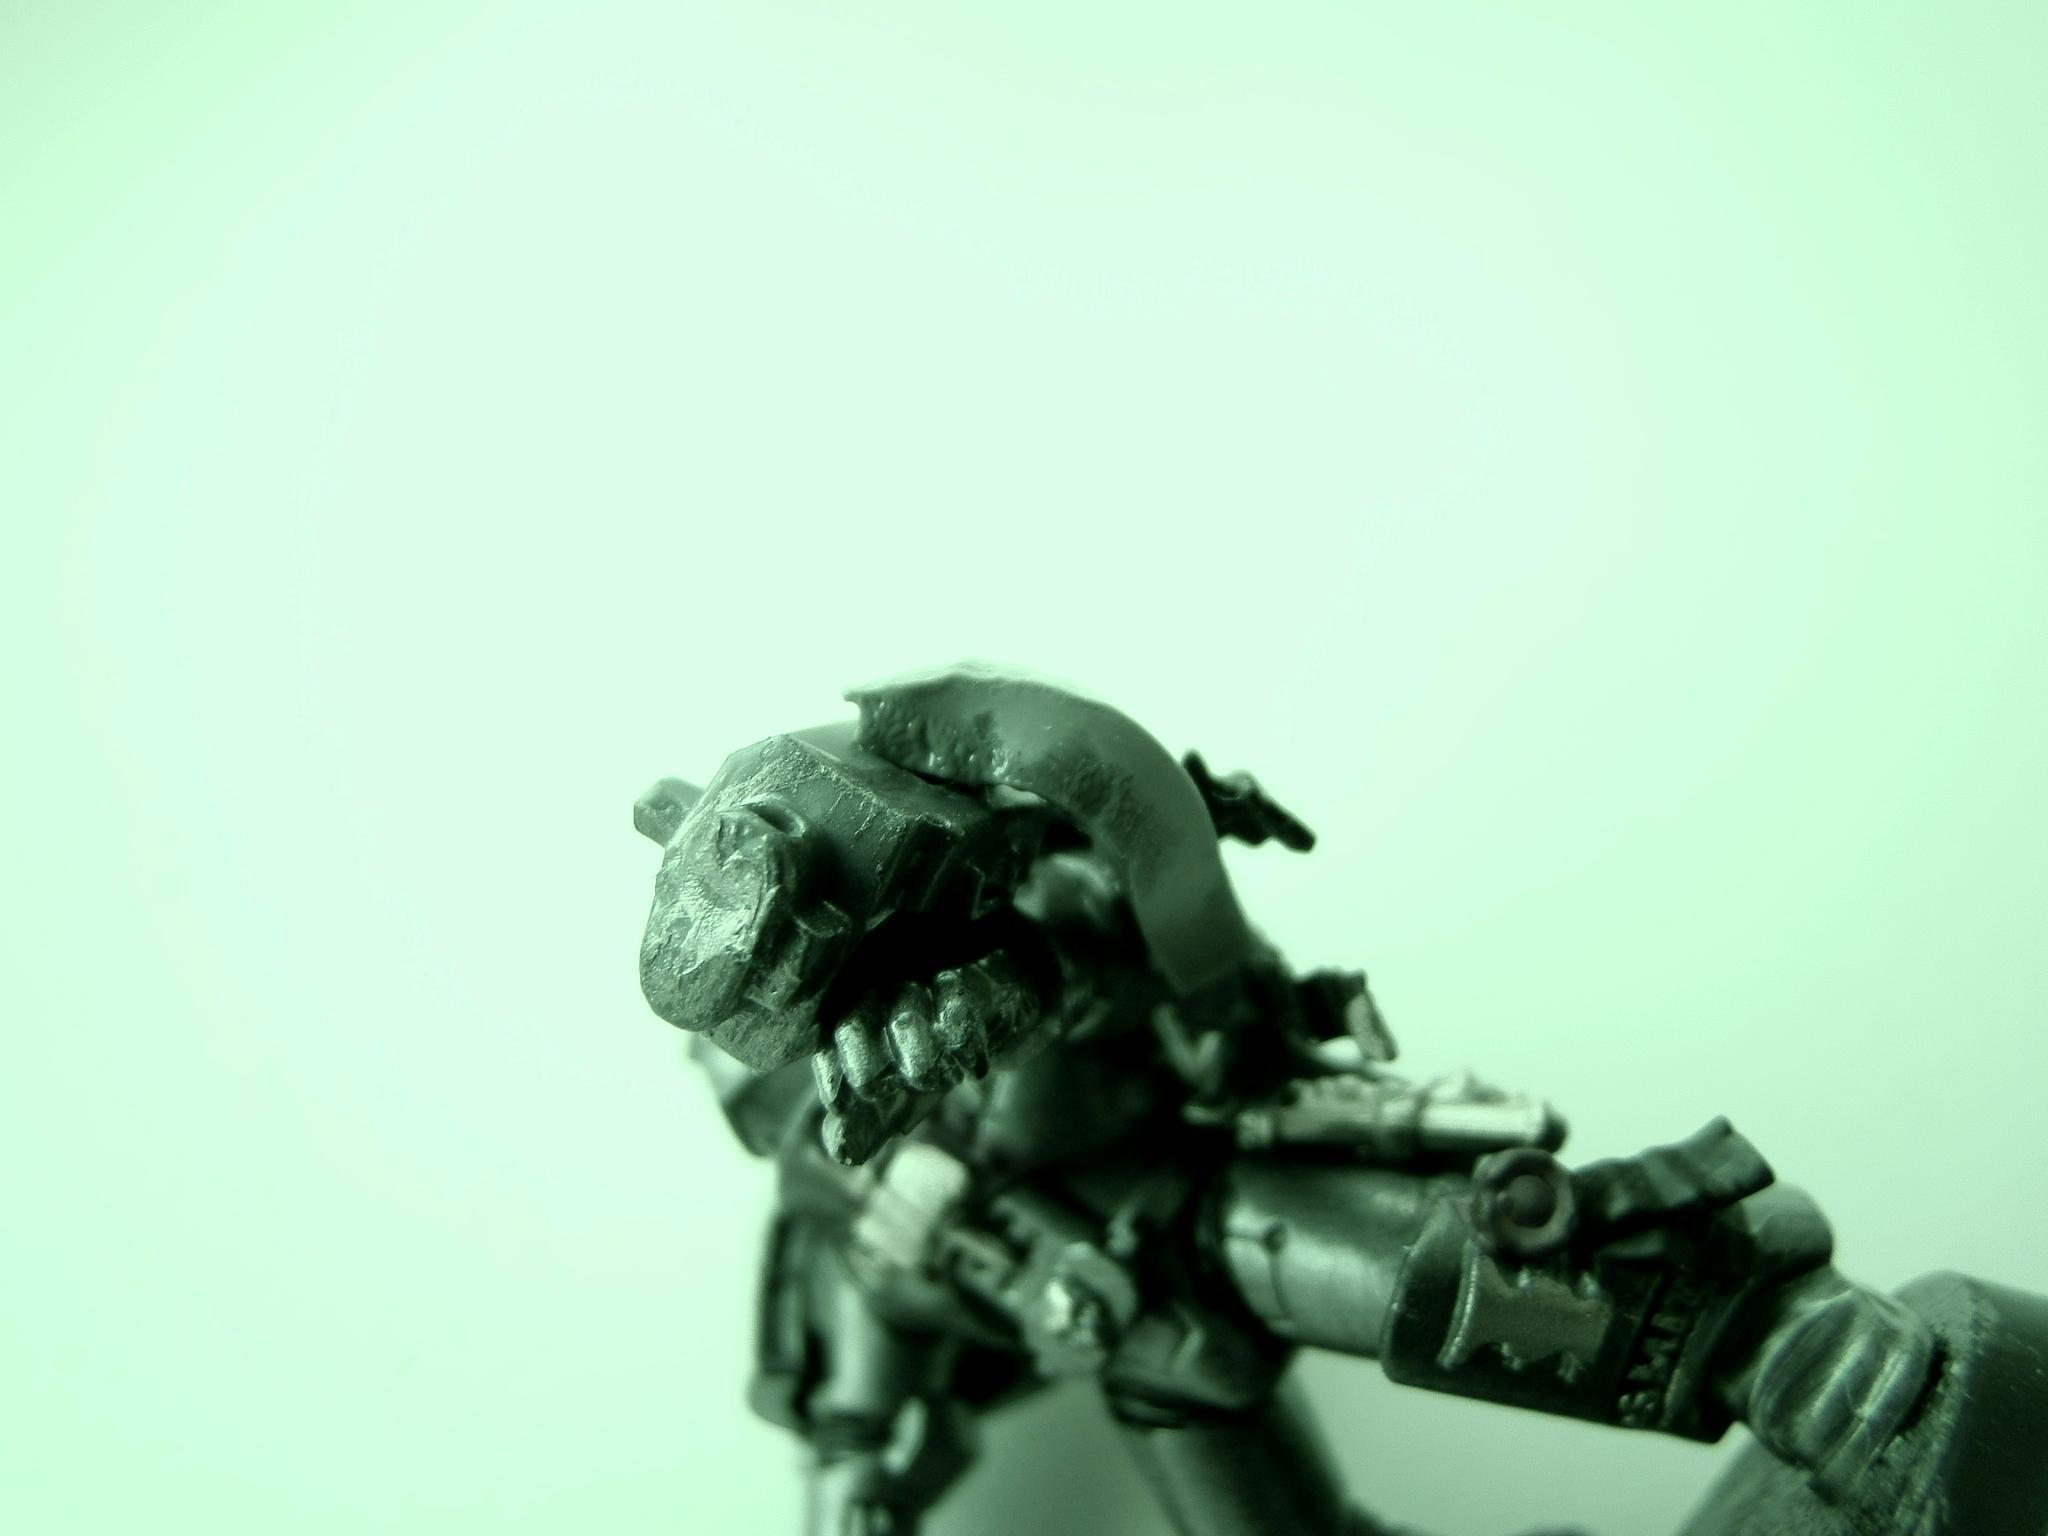 Space Marines Grey Knights Wip, Warhammer 40,000